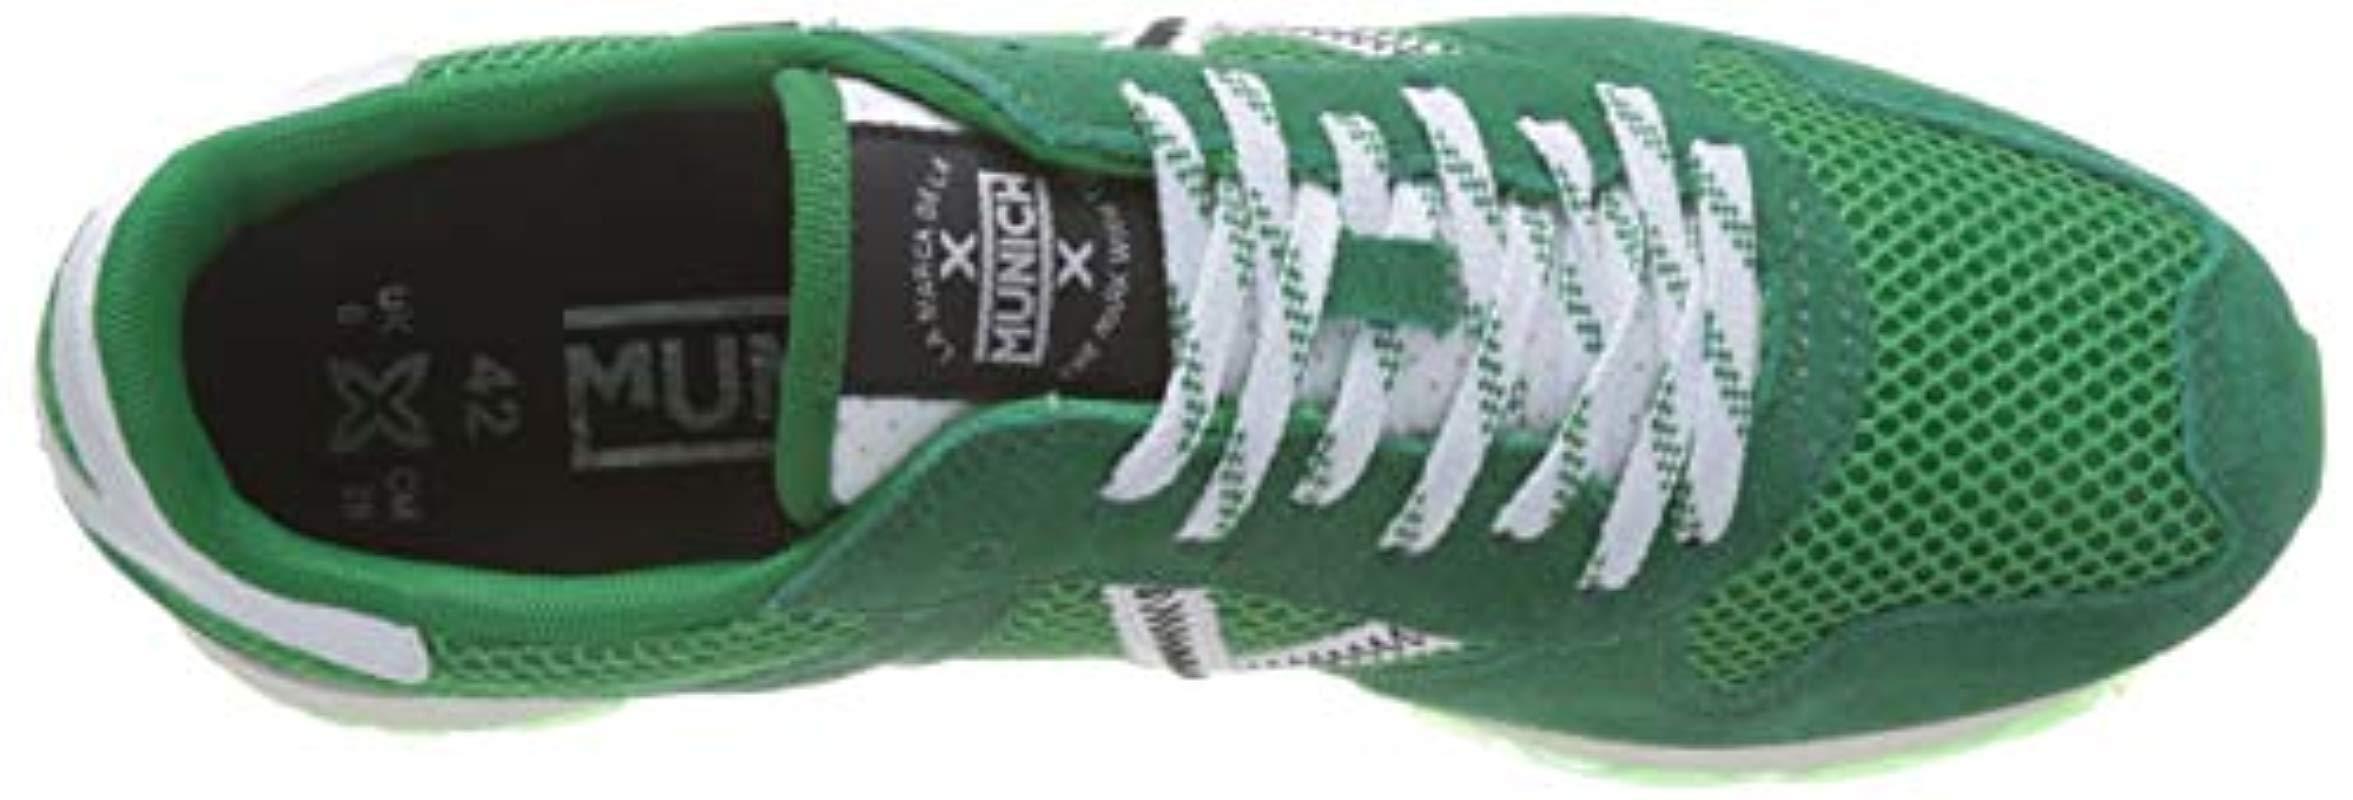 ed7d2b7b50d Massana, Zapatillas Unisex Adulto, (Verde 318), 42 EU Munich de ...